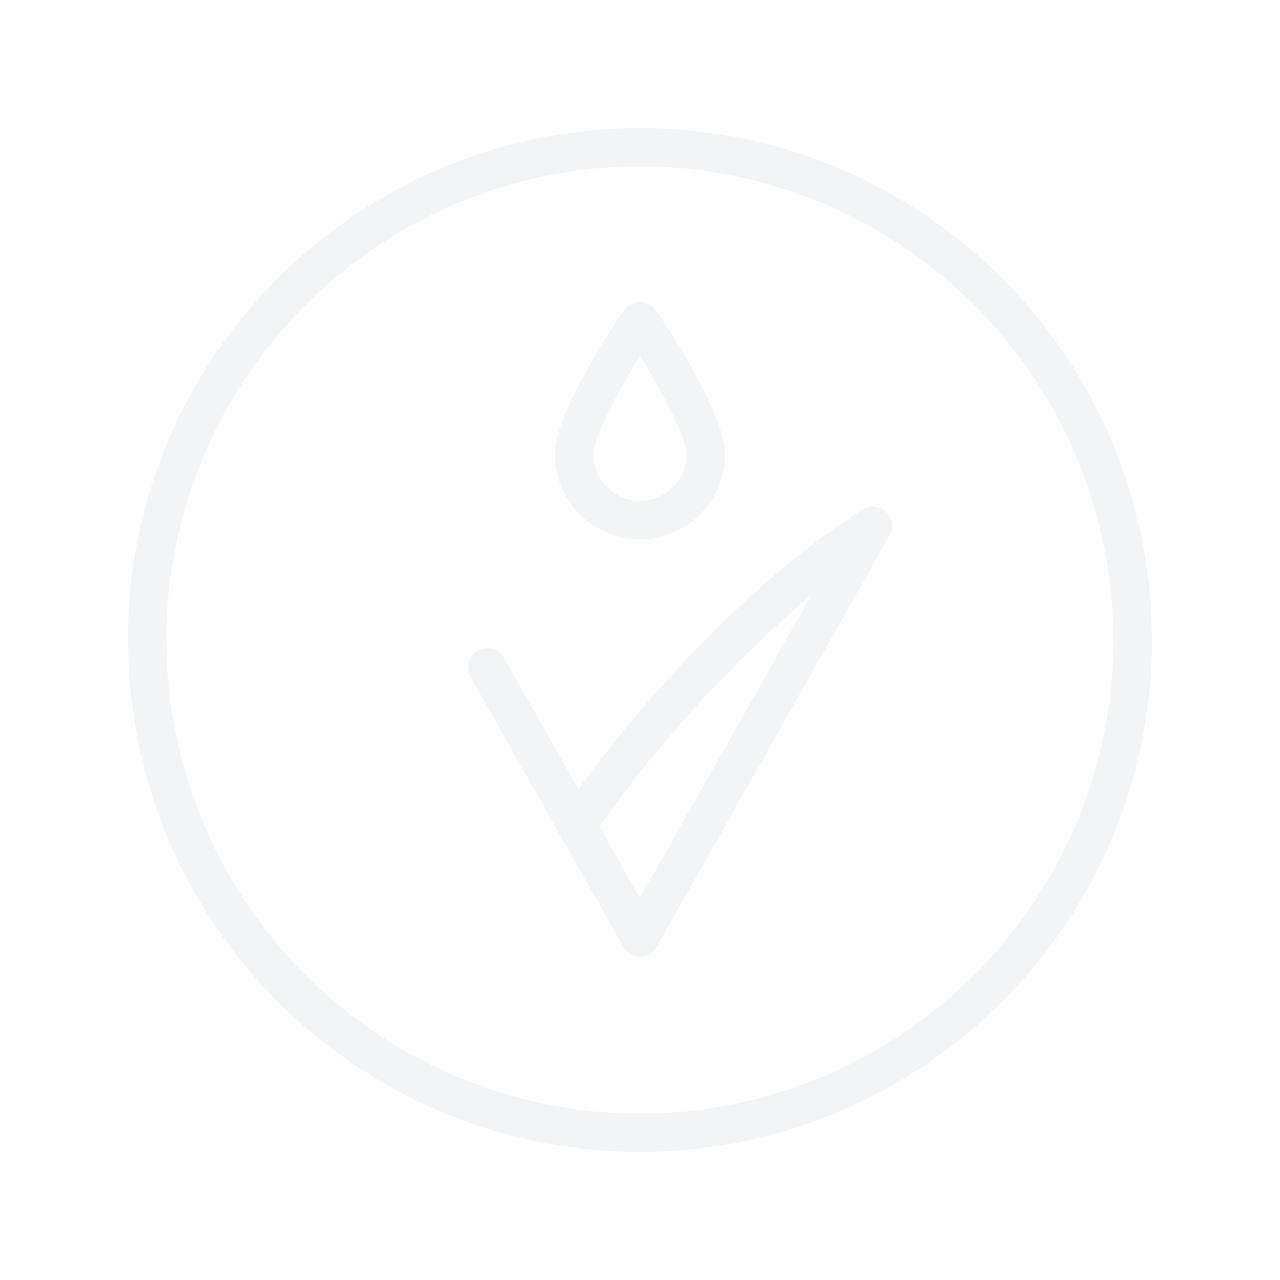 Dior 5 Couleurs Eyeshadow 6g